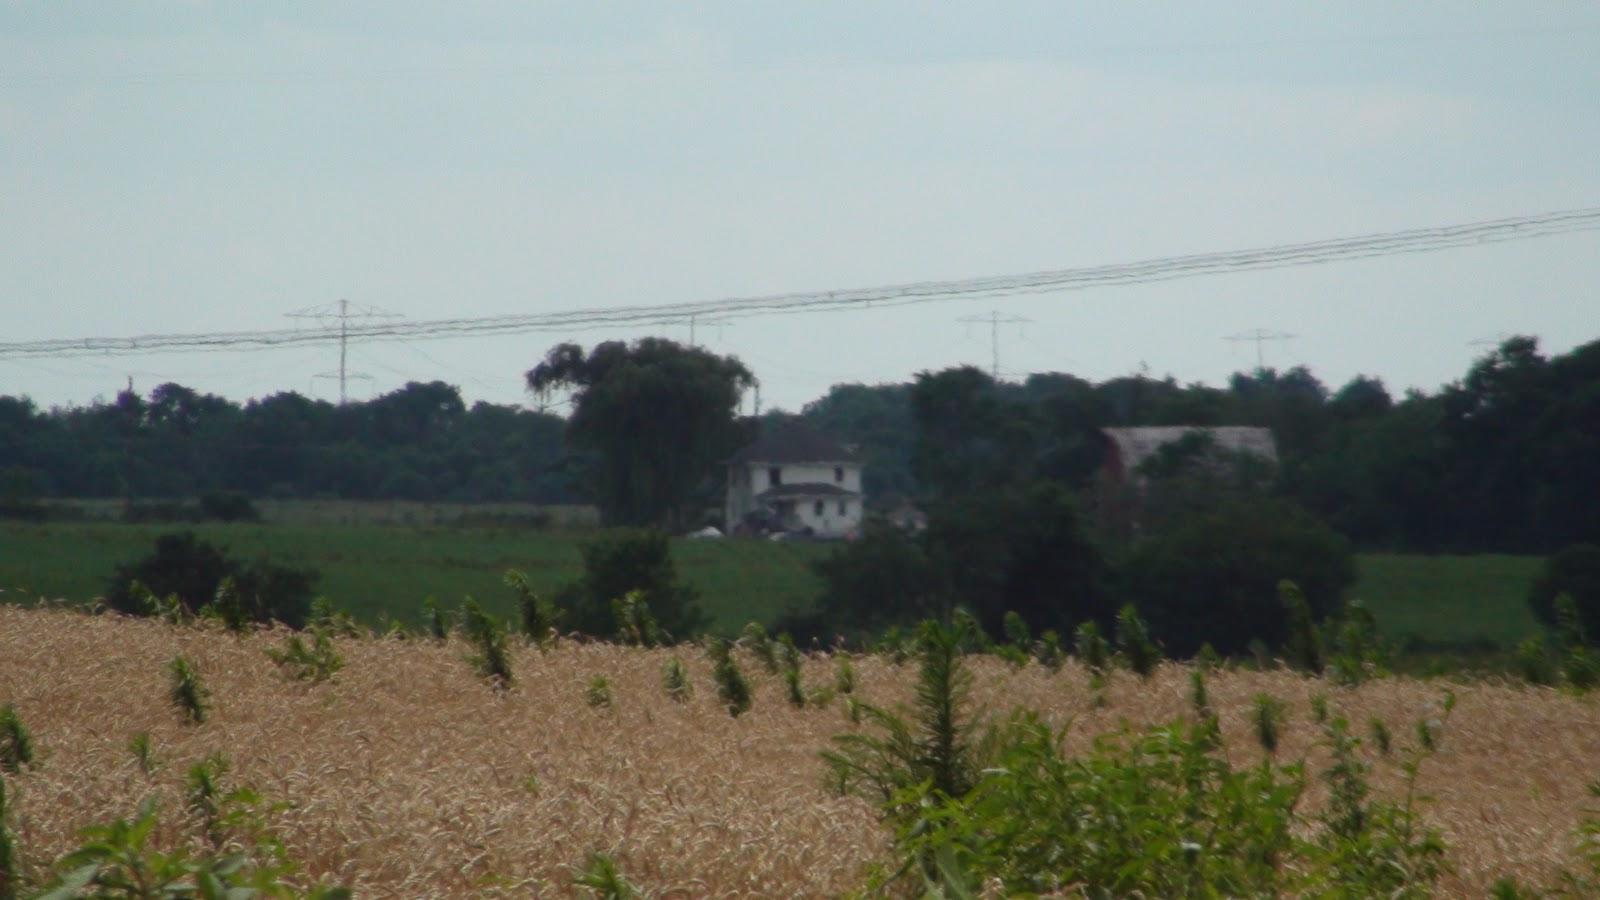 Illinois will county peotone - American Fousquare Farmhouse Near Manhattan Illinois Rear View